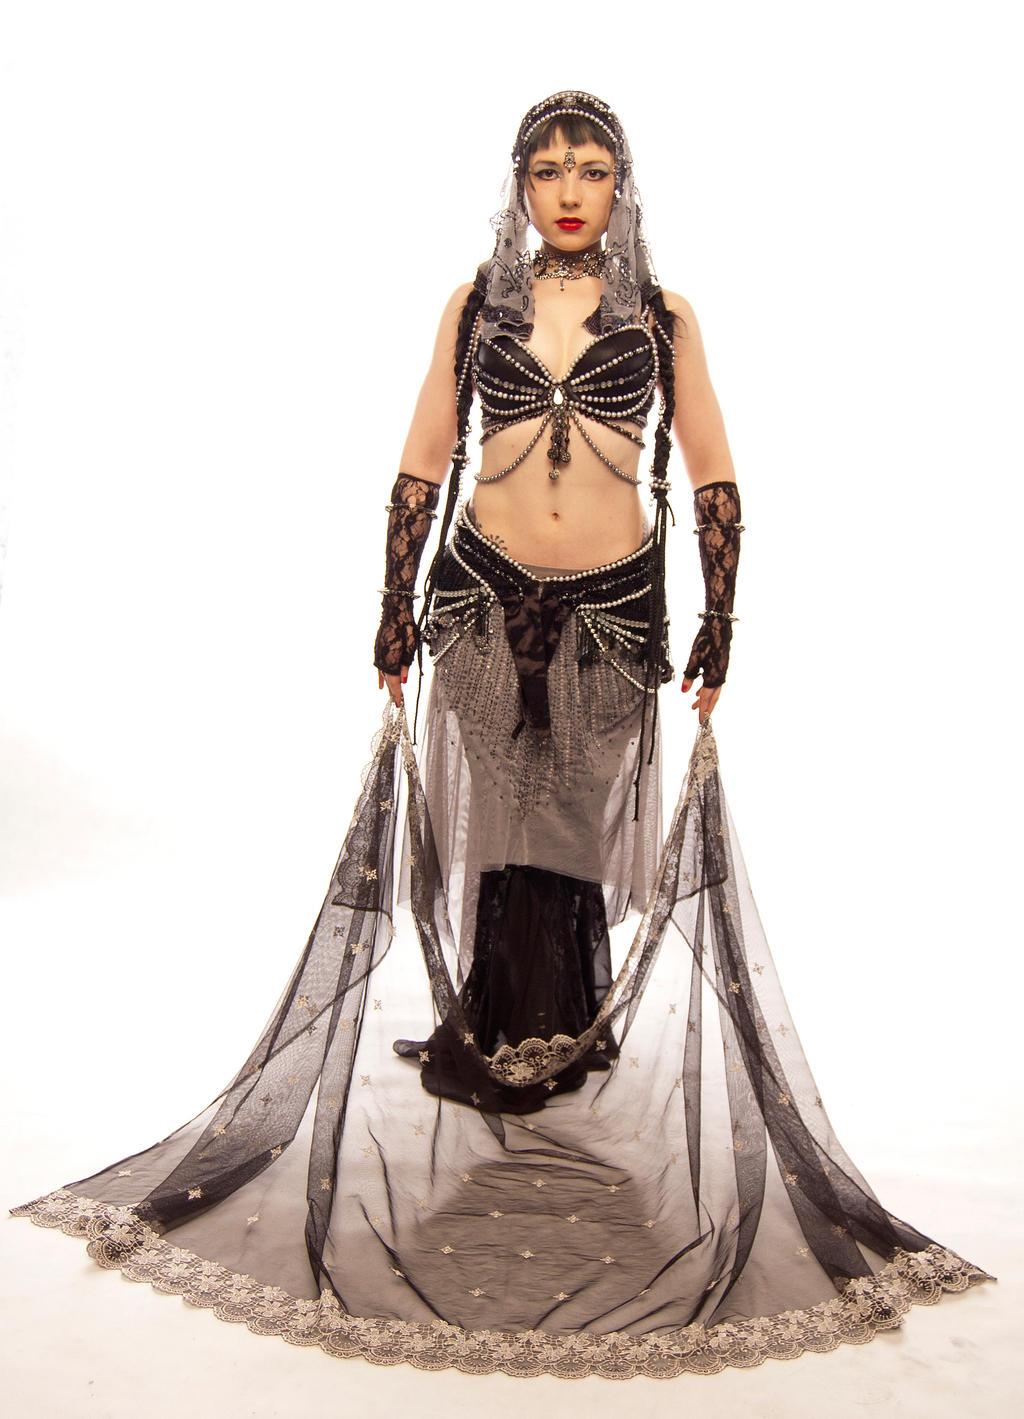 STOCK - Tribal Fusion Belly Dancer - Apsara 13 by Apsara-Art